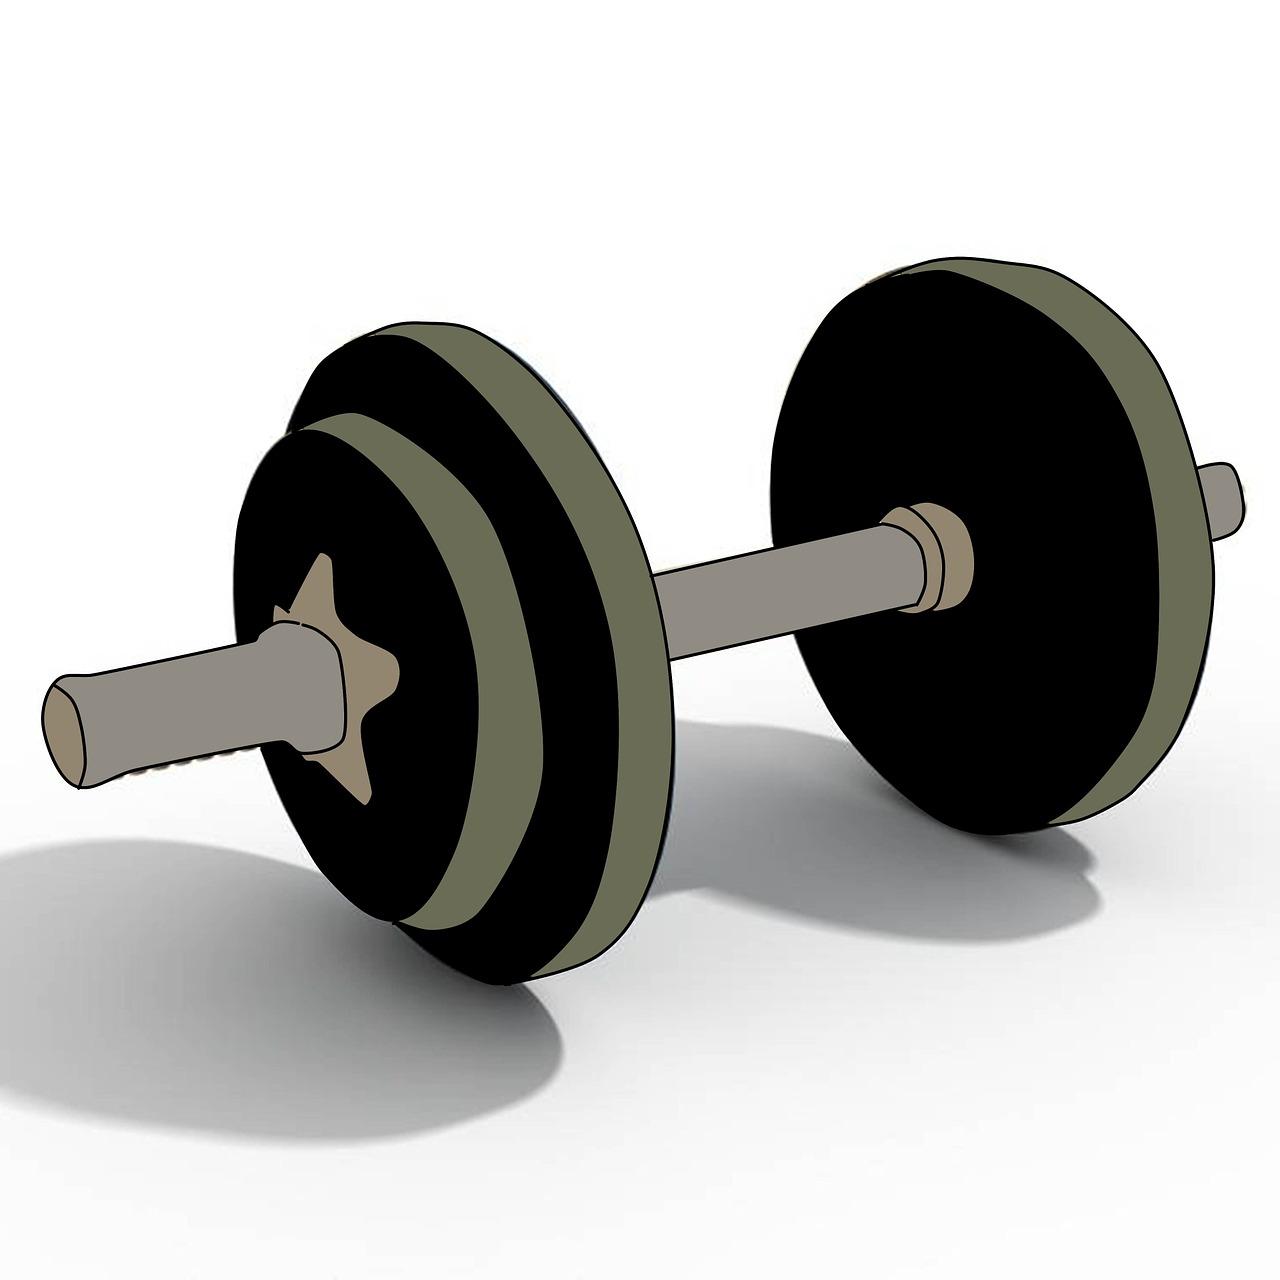 Musculacao Peso Academia Imagens Gratis No Pixabay